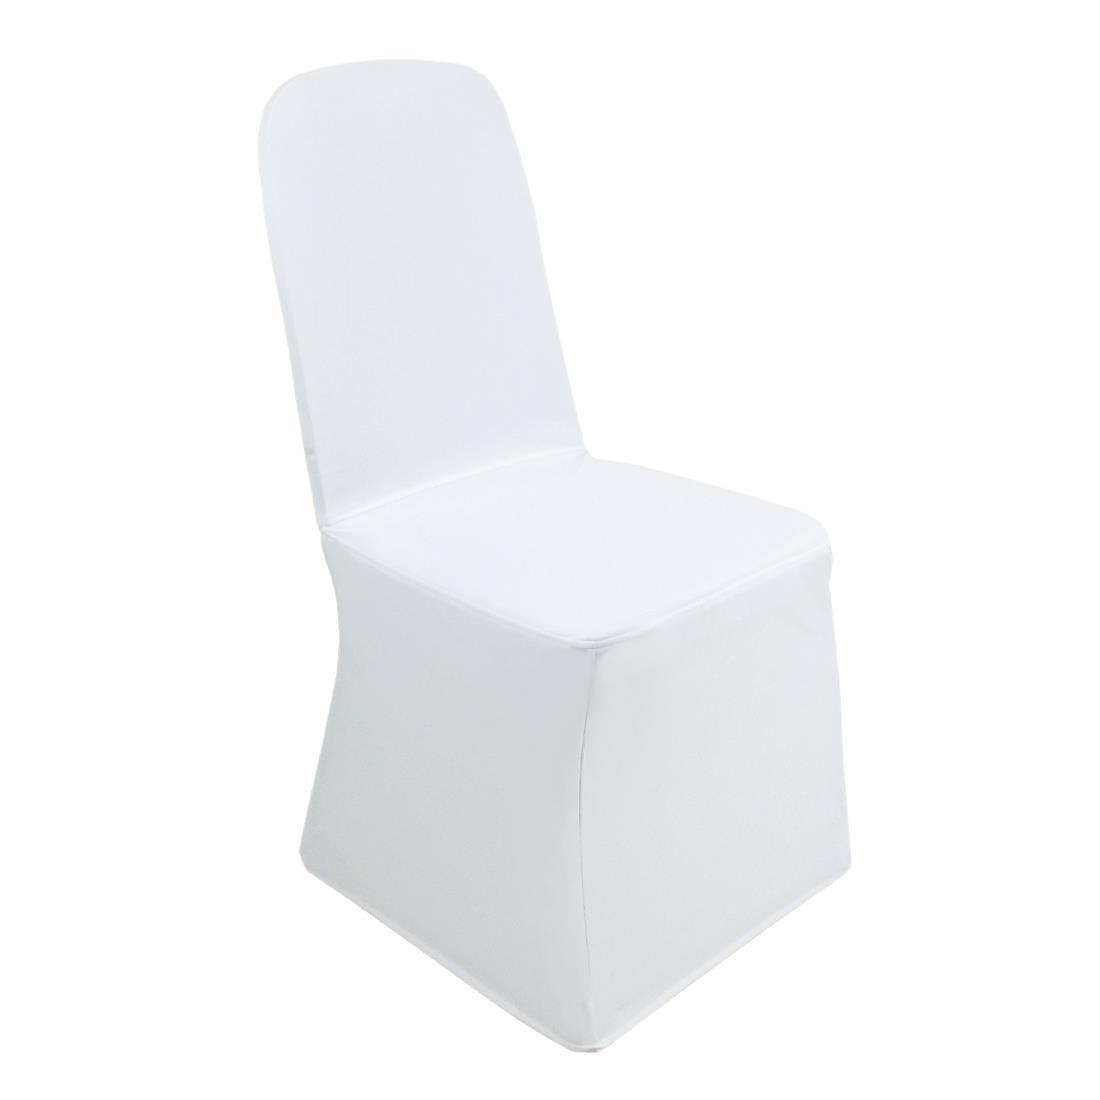 Banquet Chair Cover - White